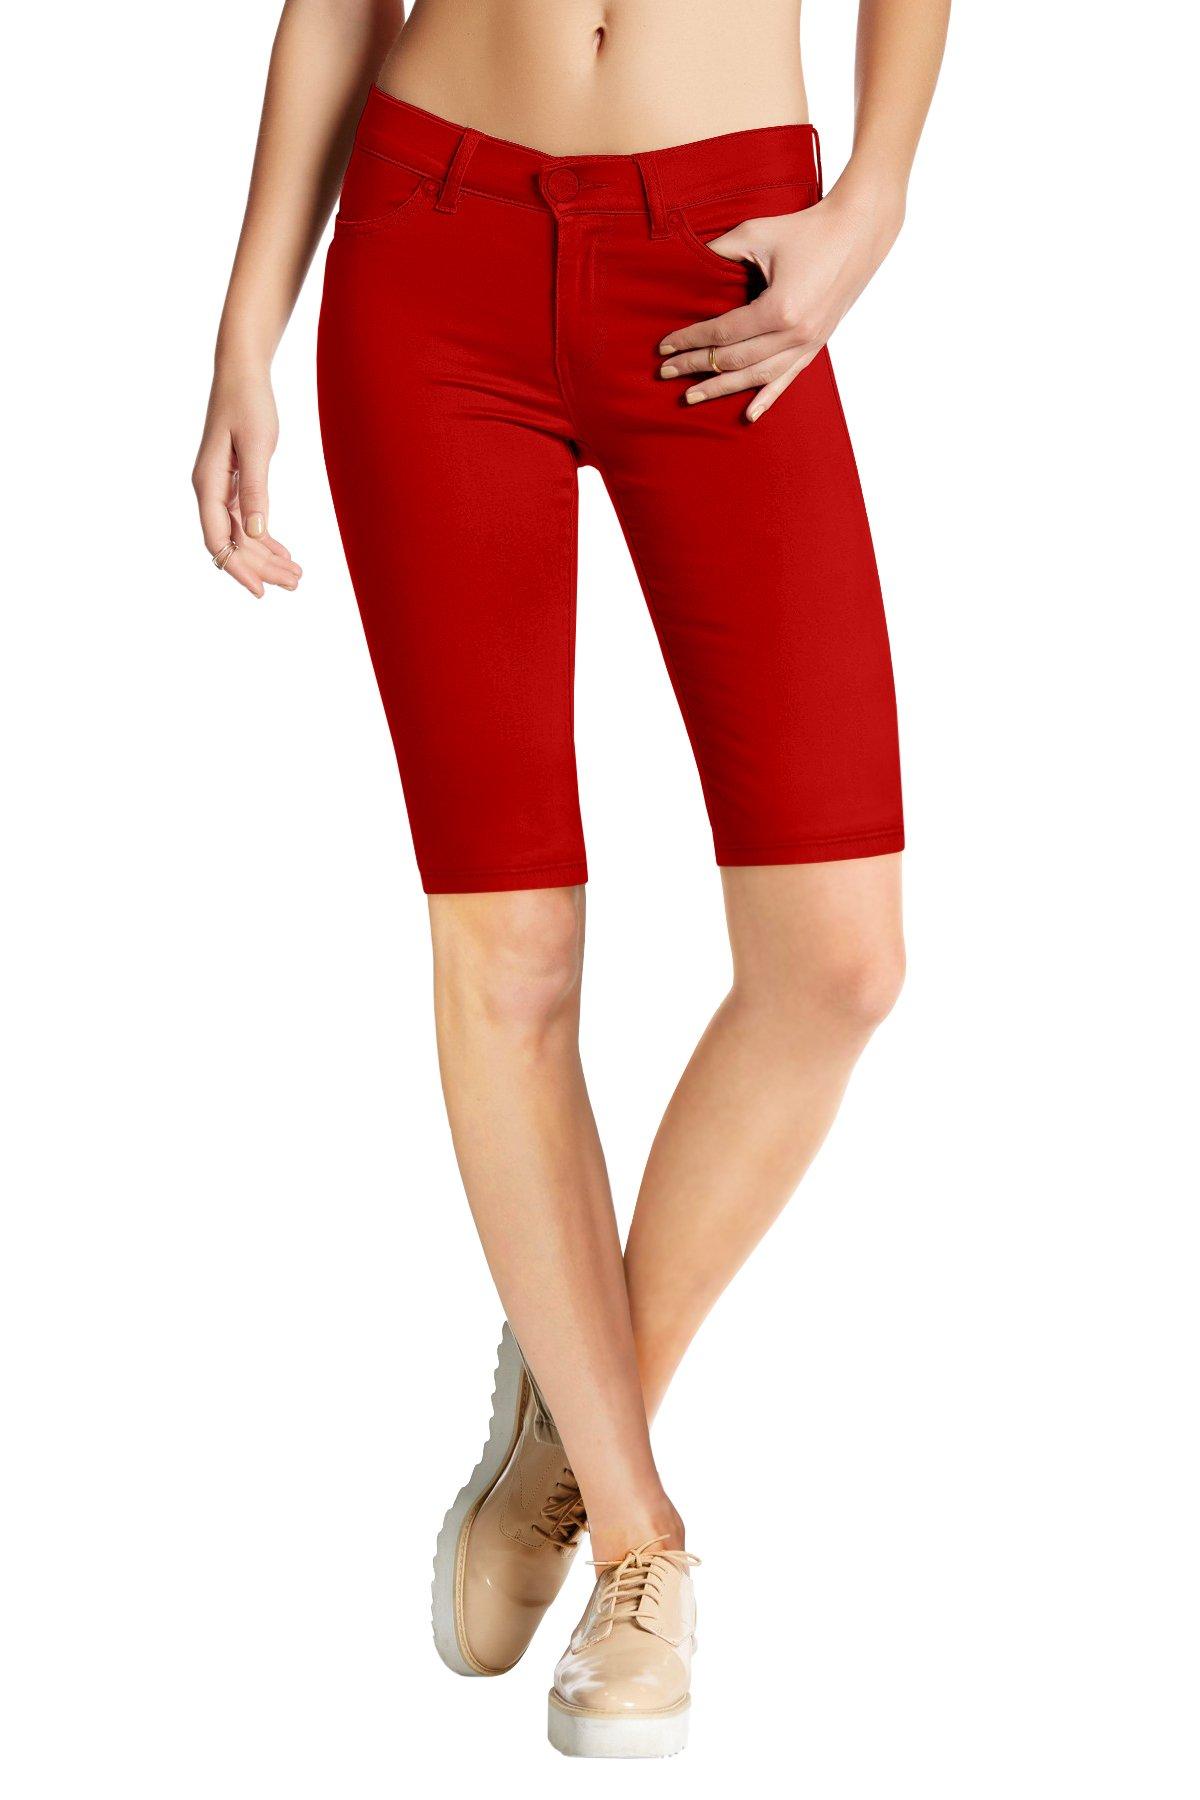 HyBrid & Company Womens Perfectly Shaping Hyper Stretch Bermuda Shorts B44876X RED 3X